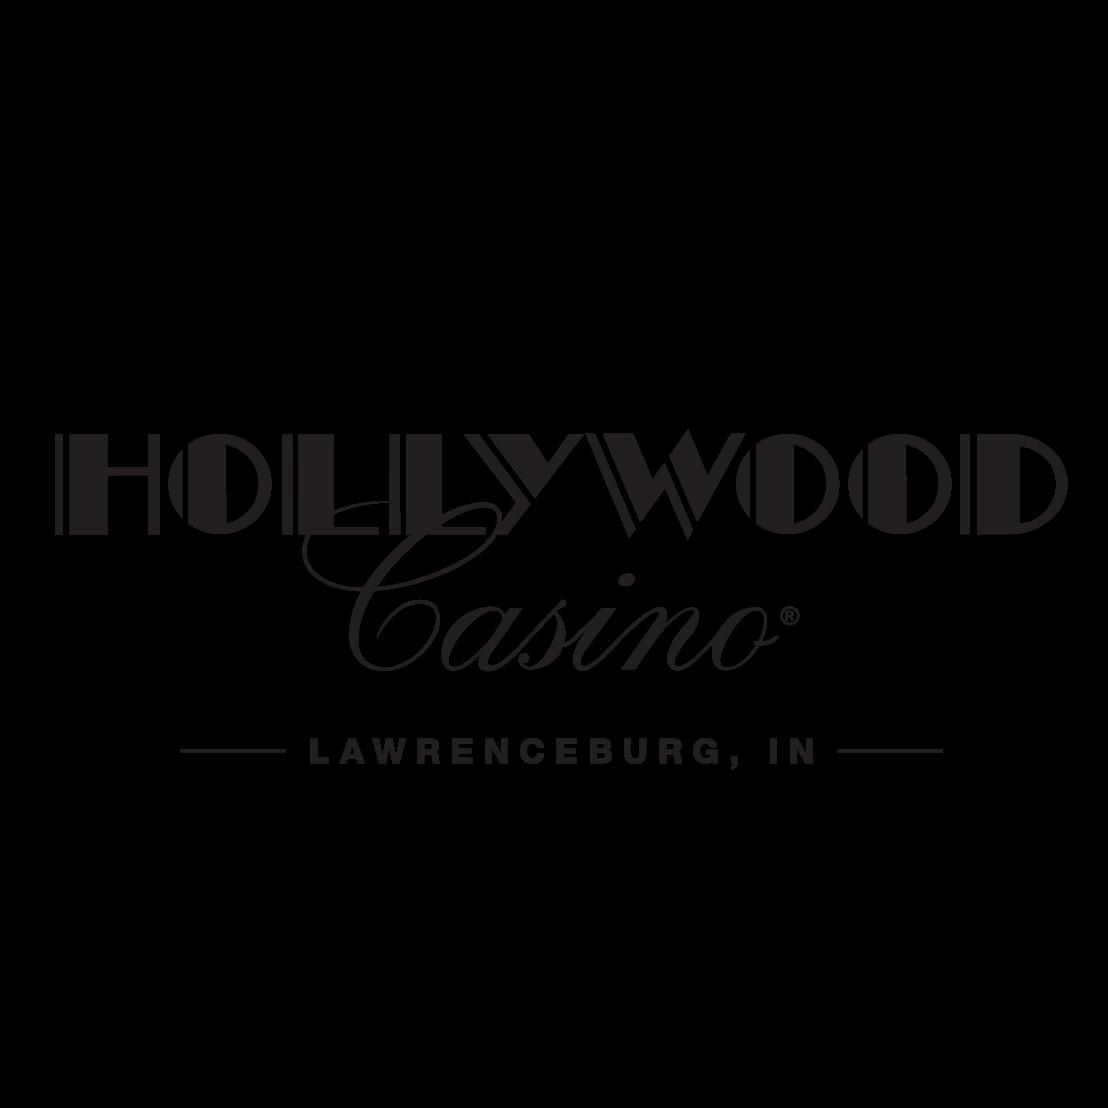 Lawrenceburg Hollywood Casino Hotel